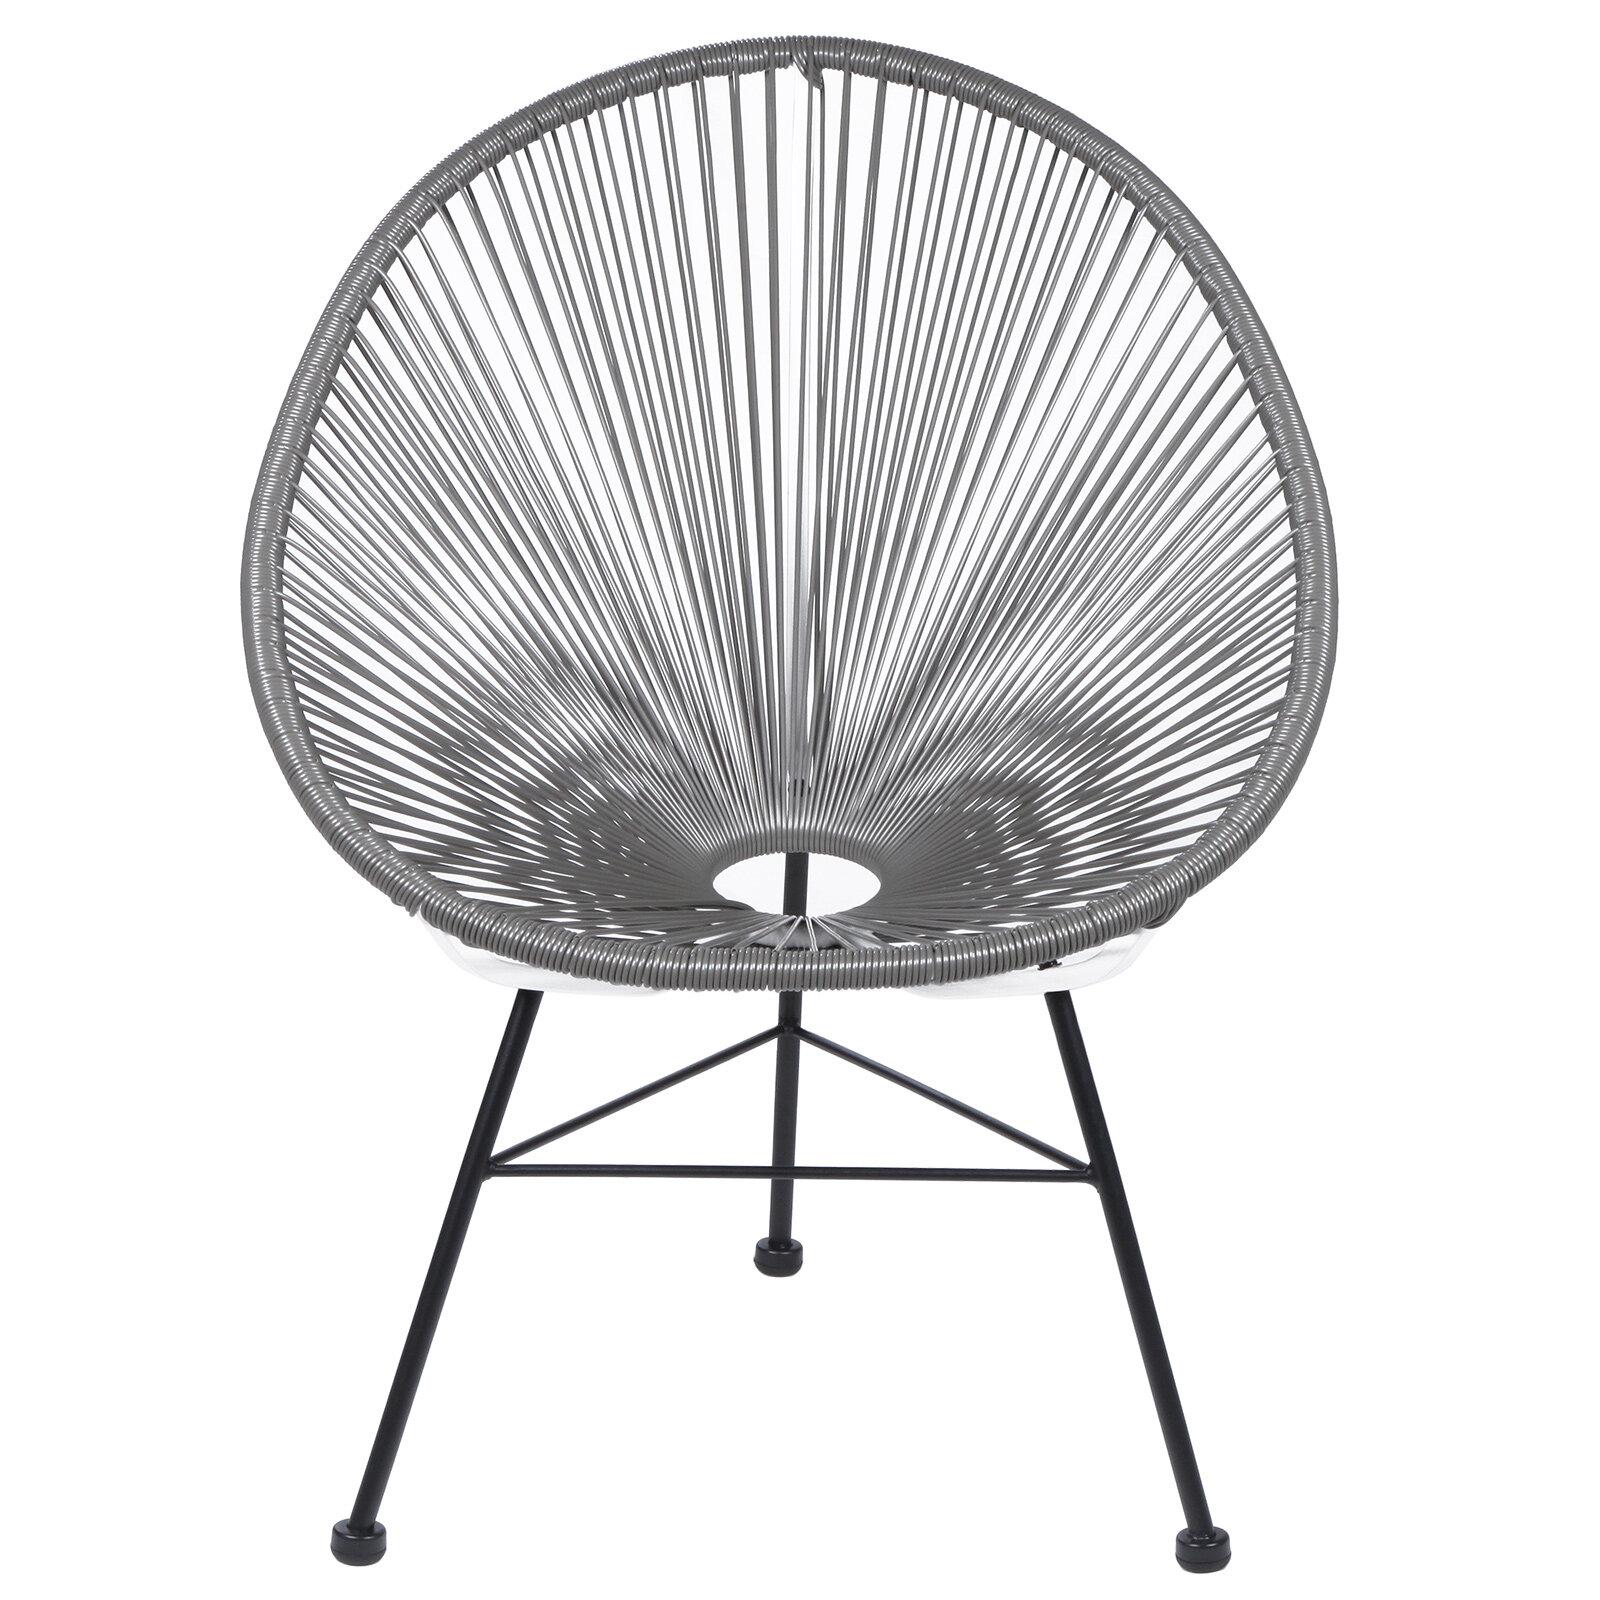 PoliVaz Acapulco Wire Basket Papasan Chair U0026 Reviews | Wayfair